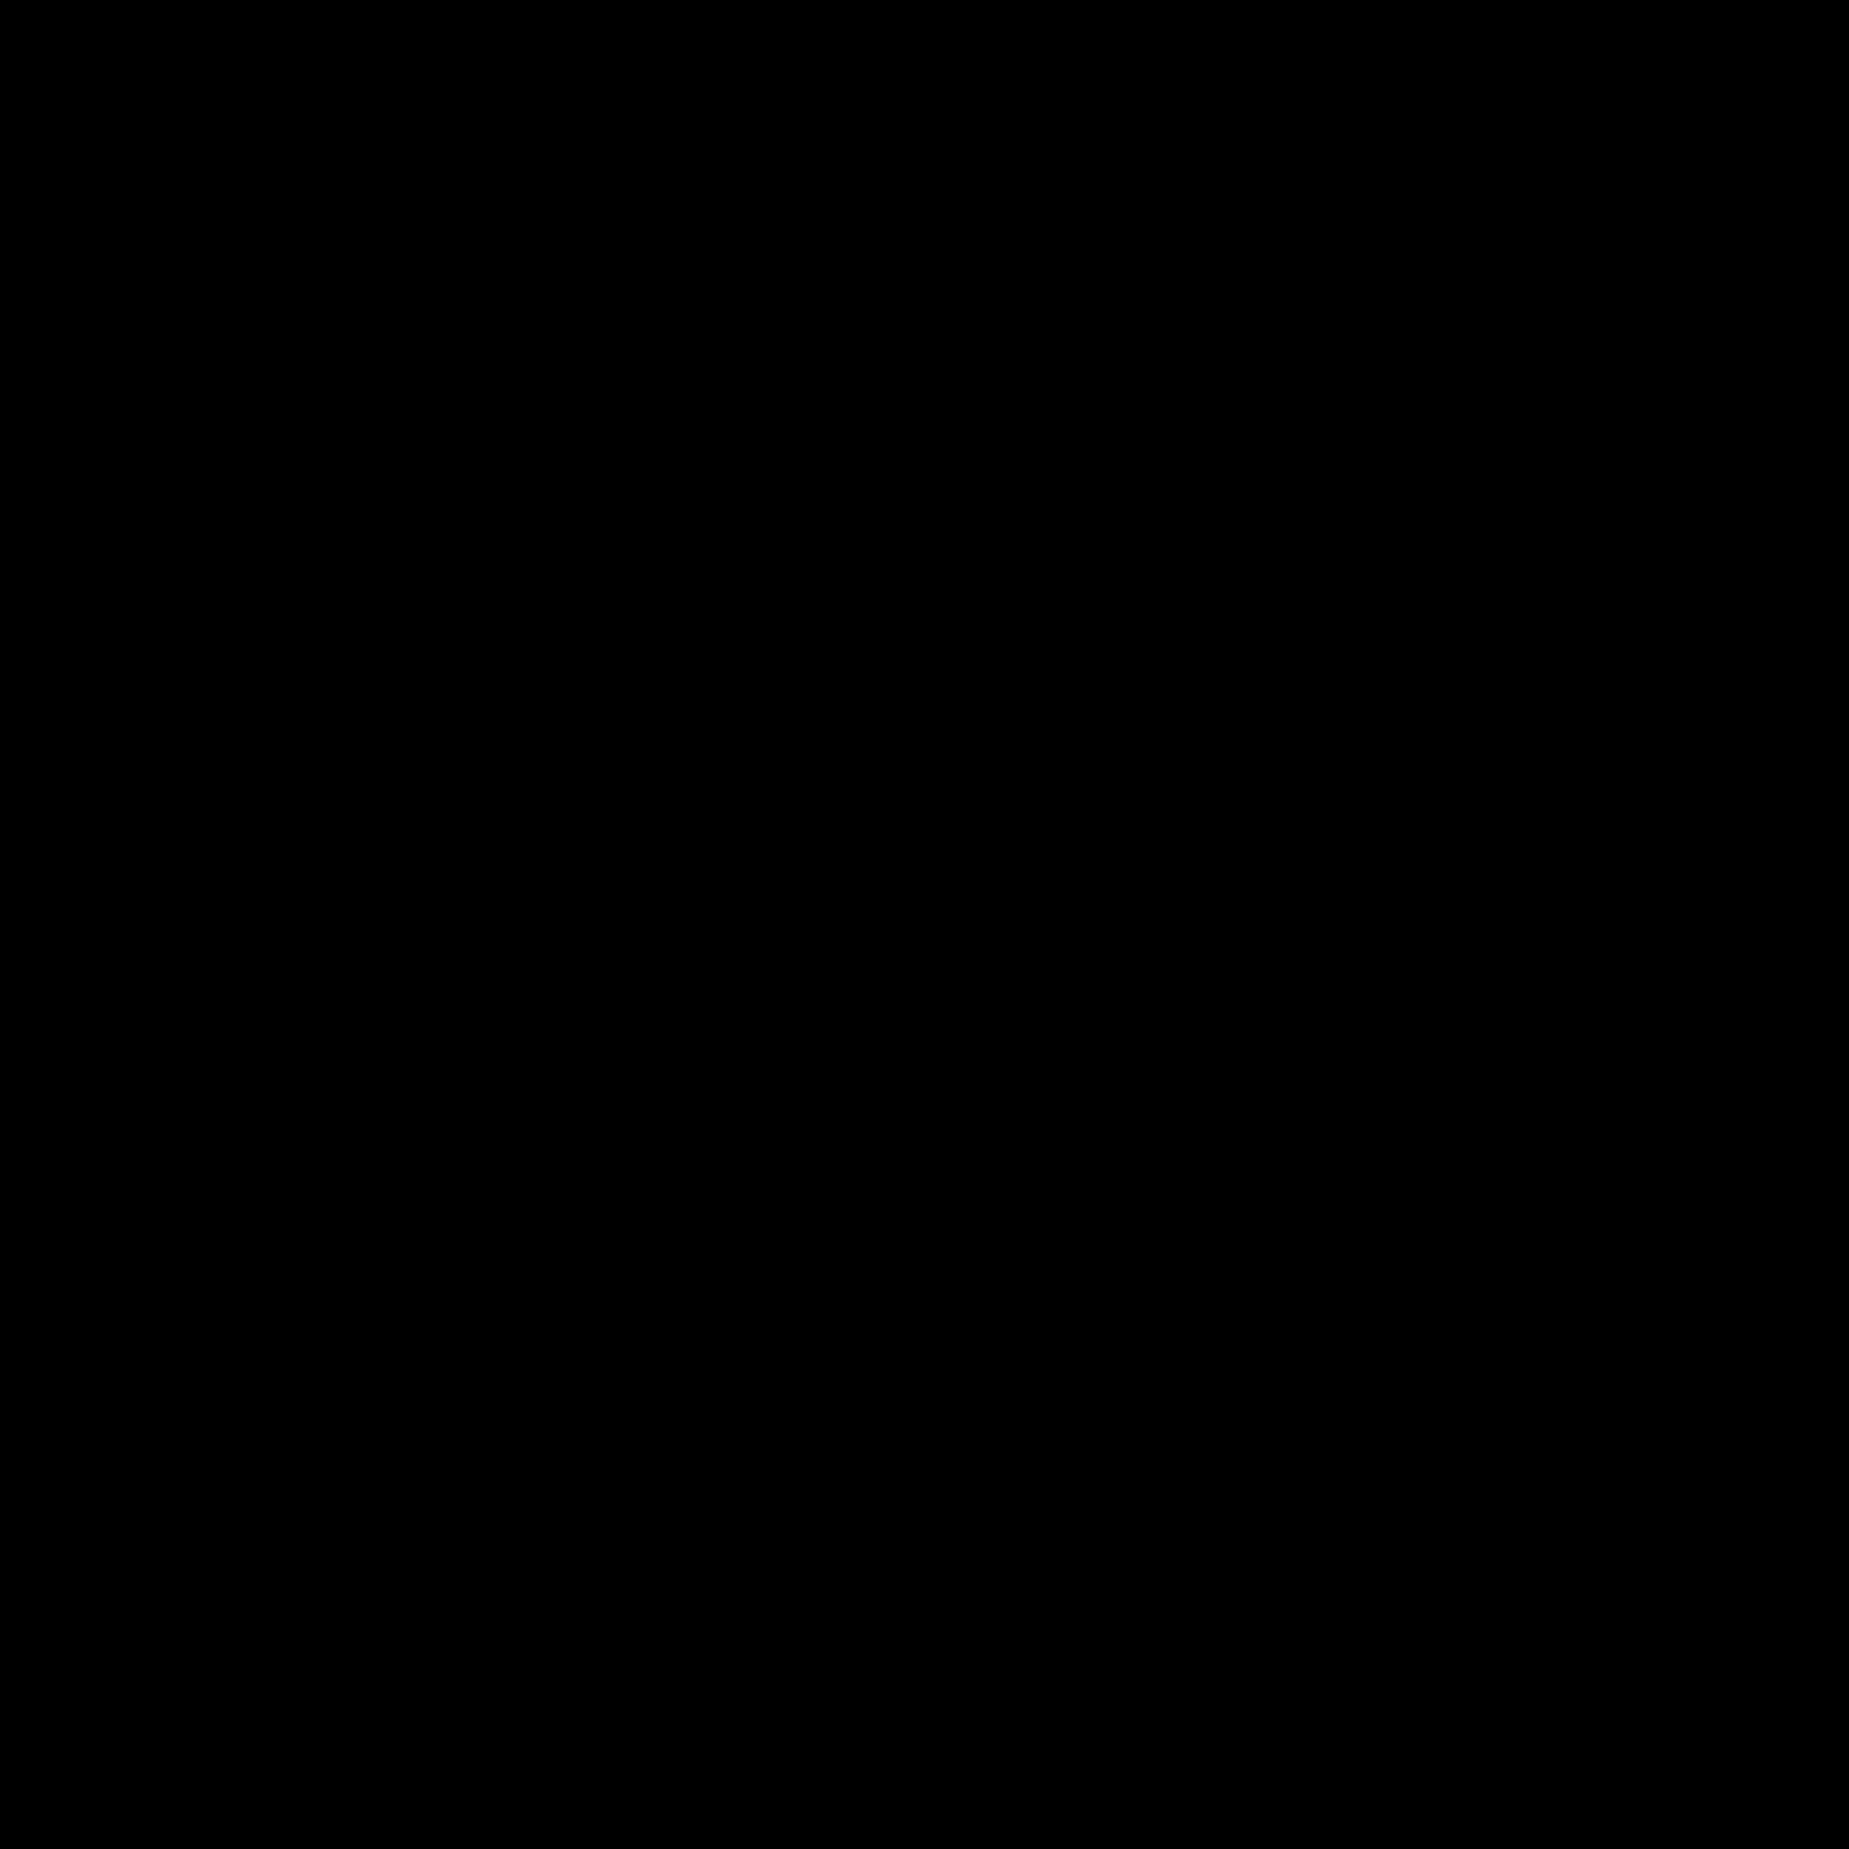 bauble – Star Shape